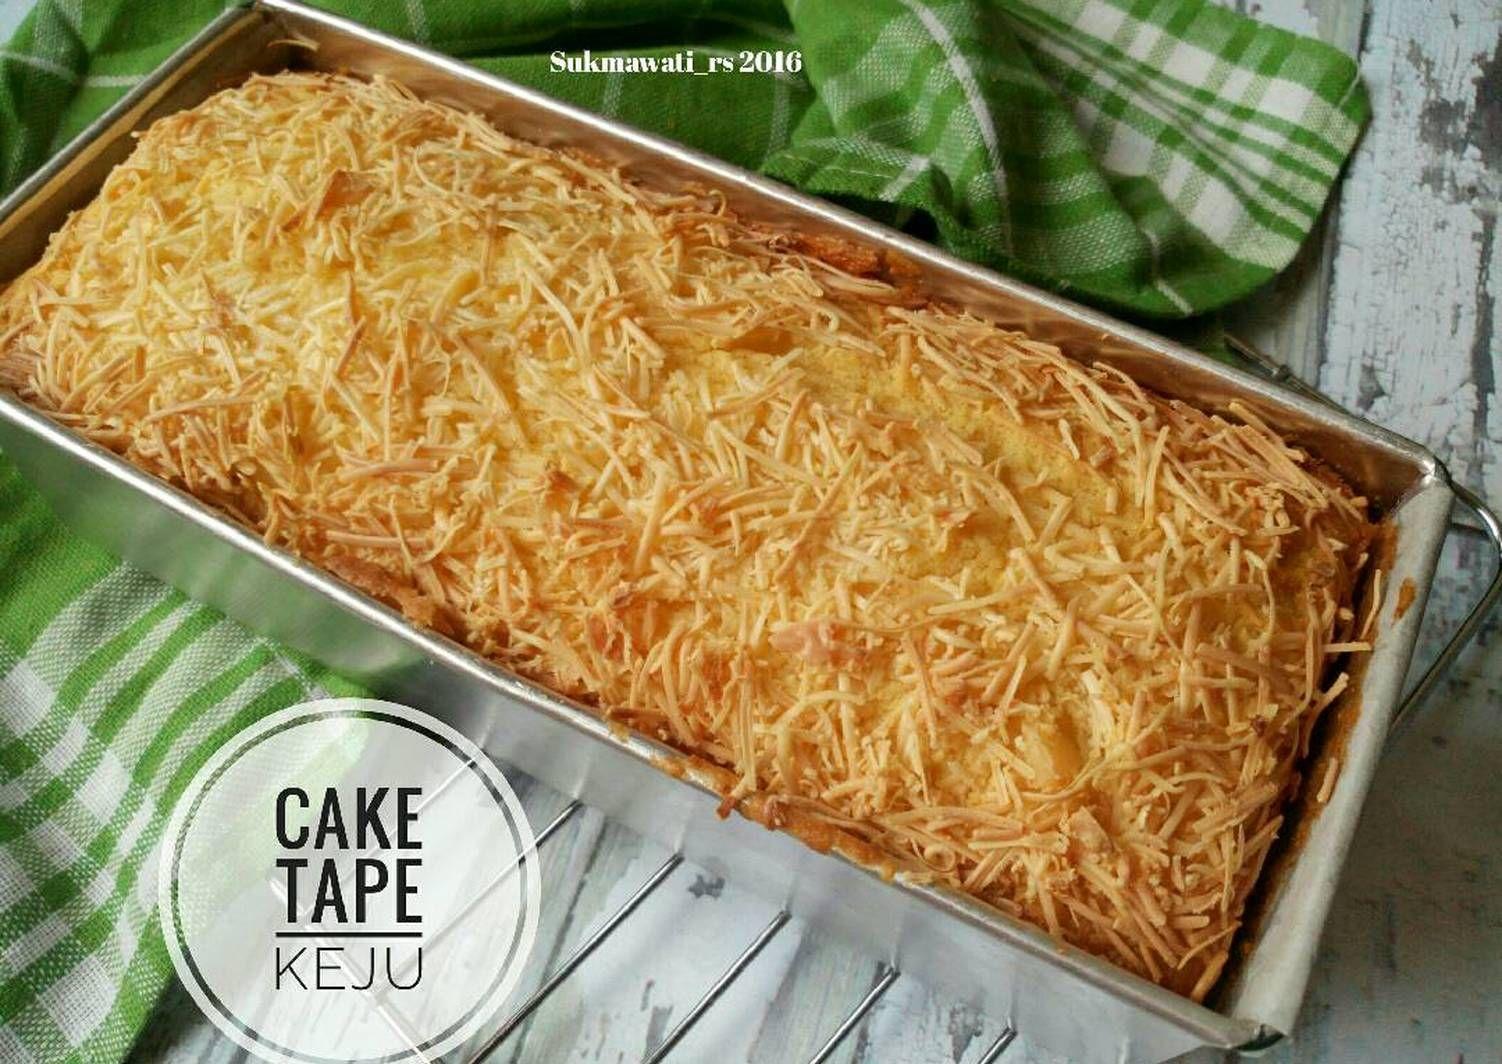 Resep Cake Tape Keju Oleh Sukmawati Rs Resep Resep Masakan Makanan Dan Minuman Masakan